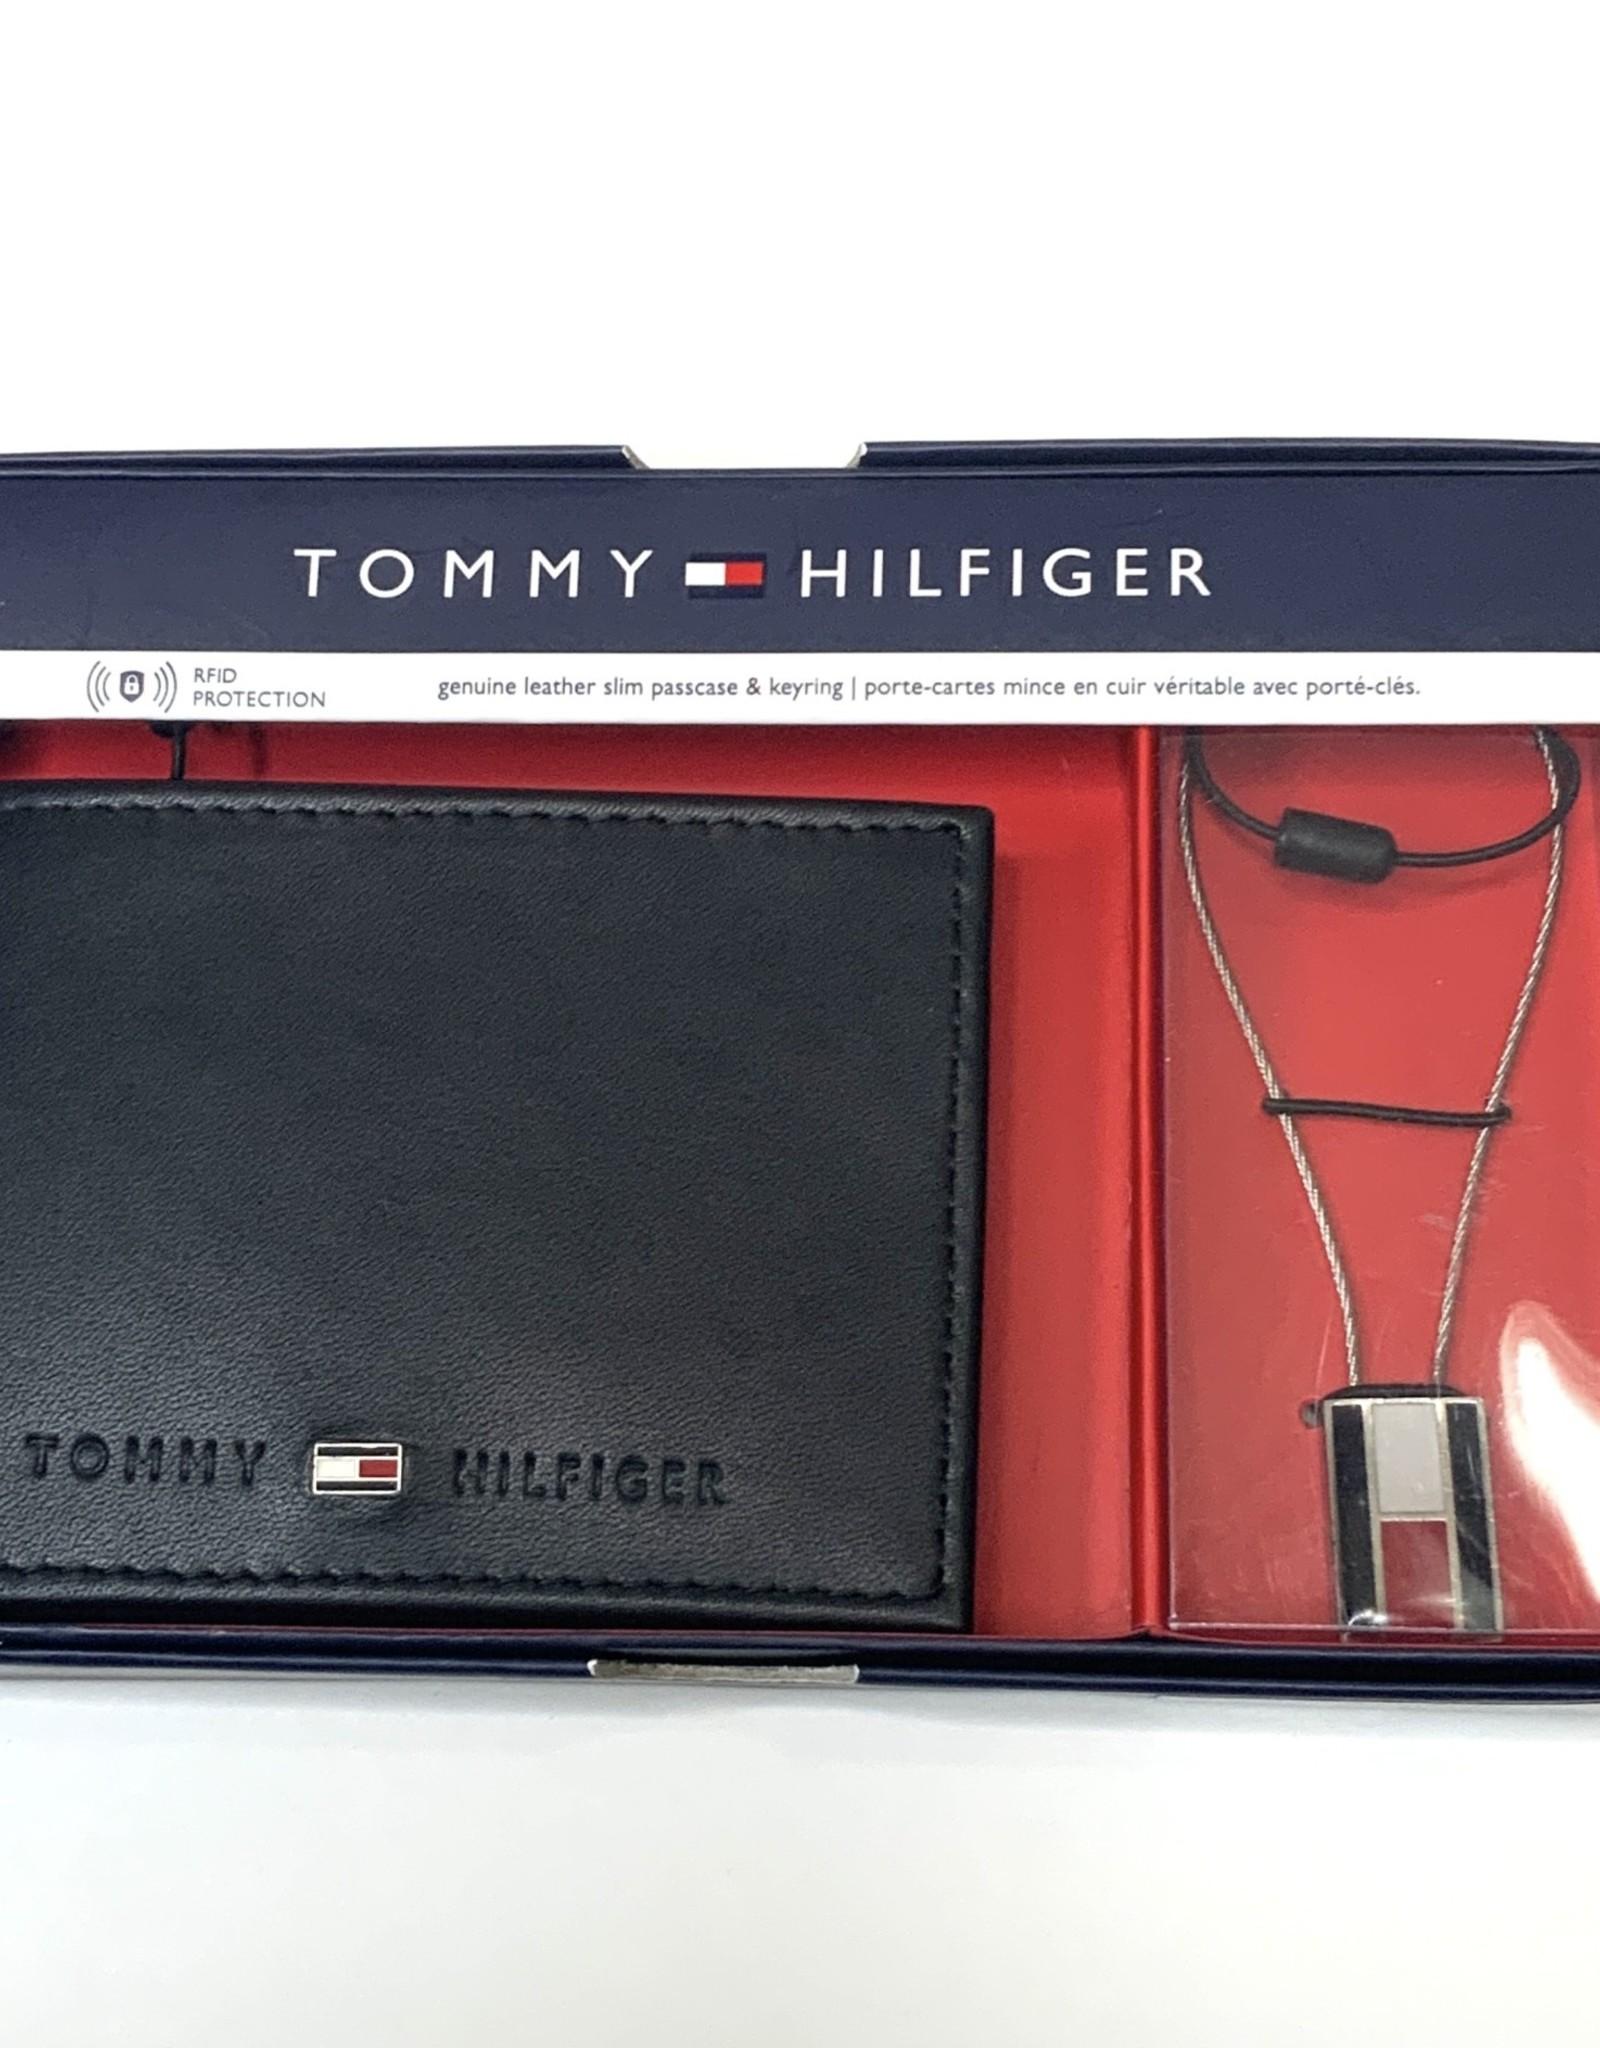 Tommy Hilfiger Tommy Hilfiger Slim Passcase & Key Ring